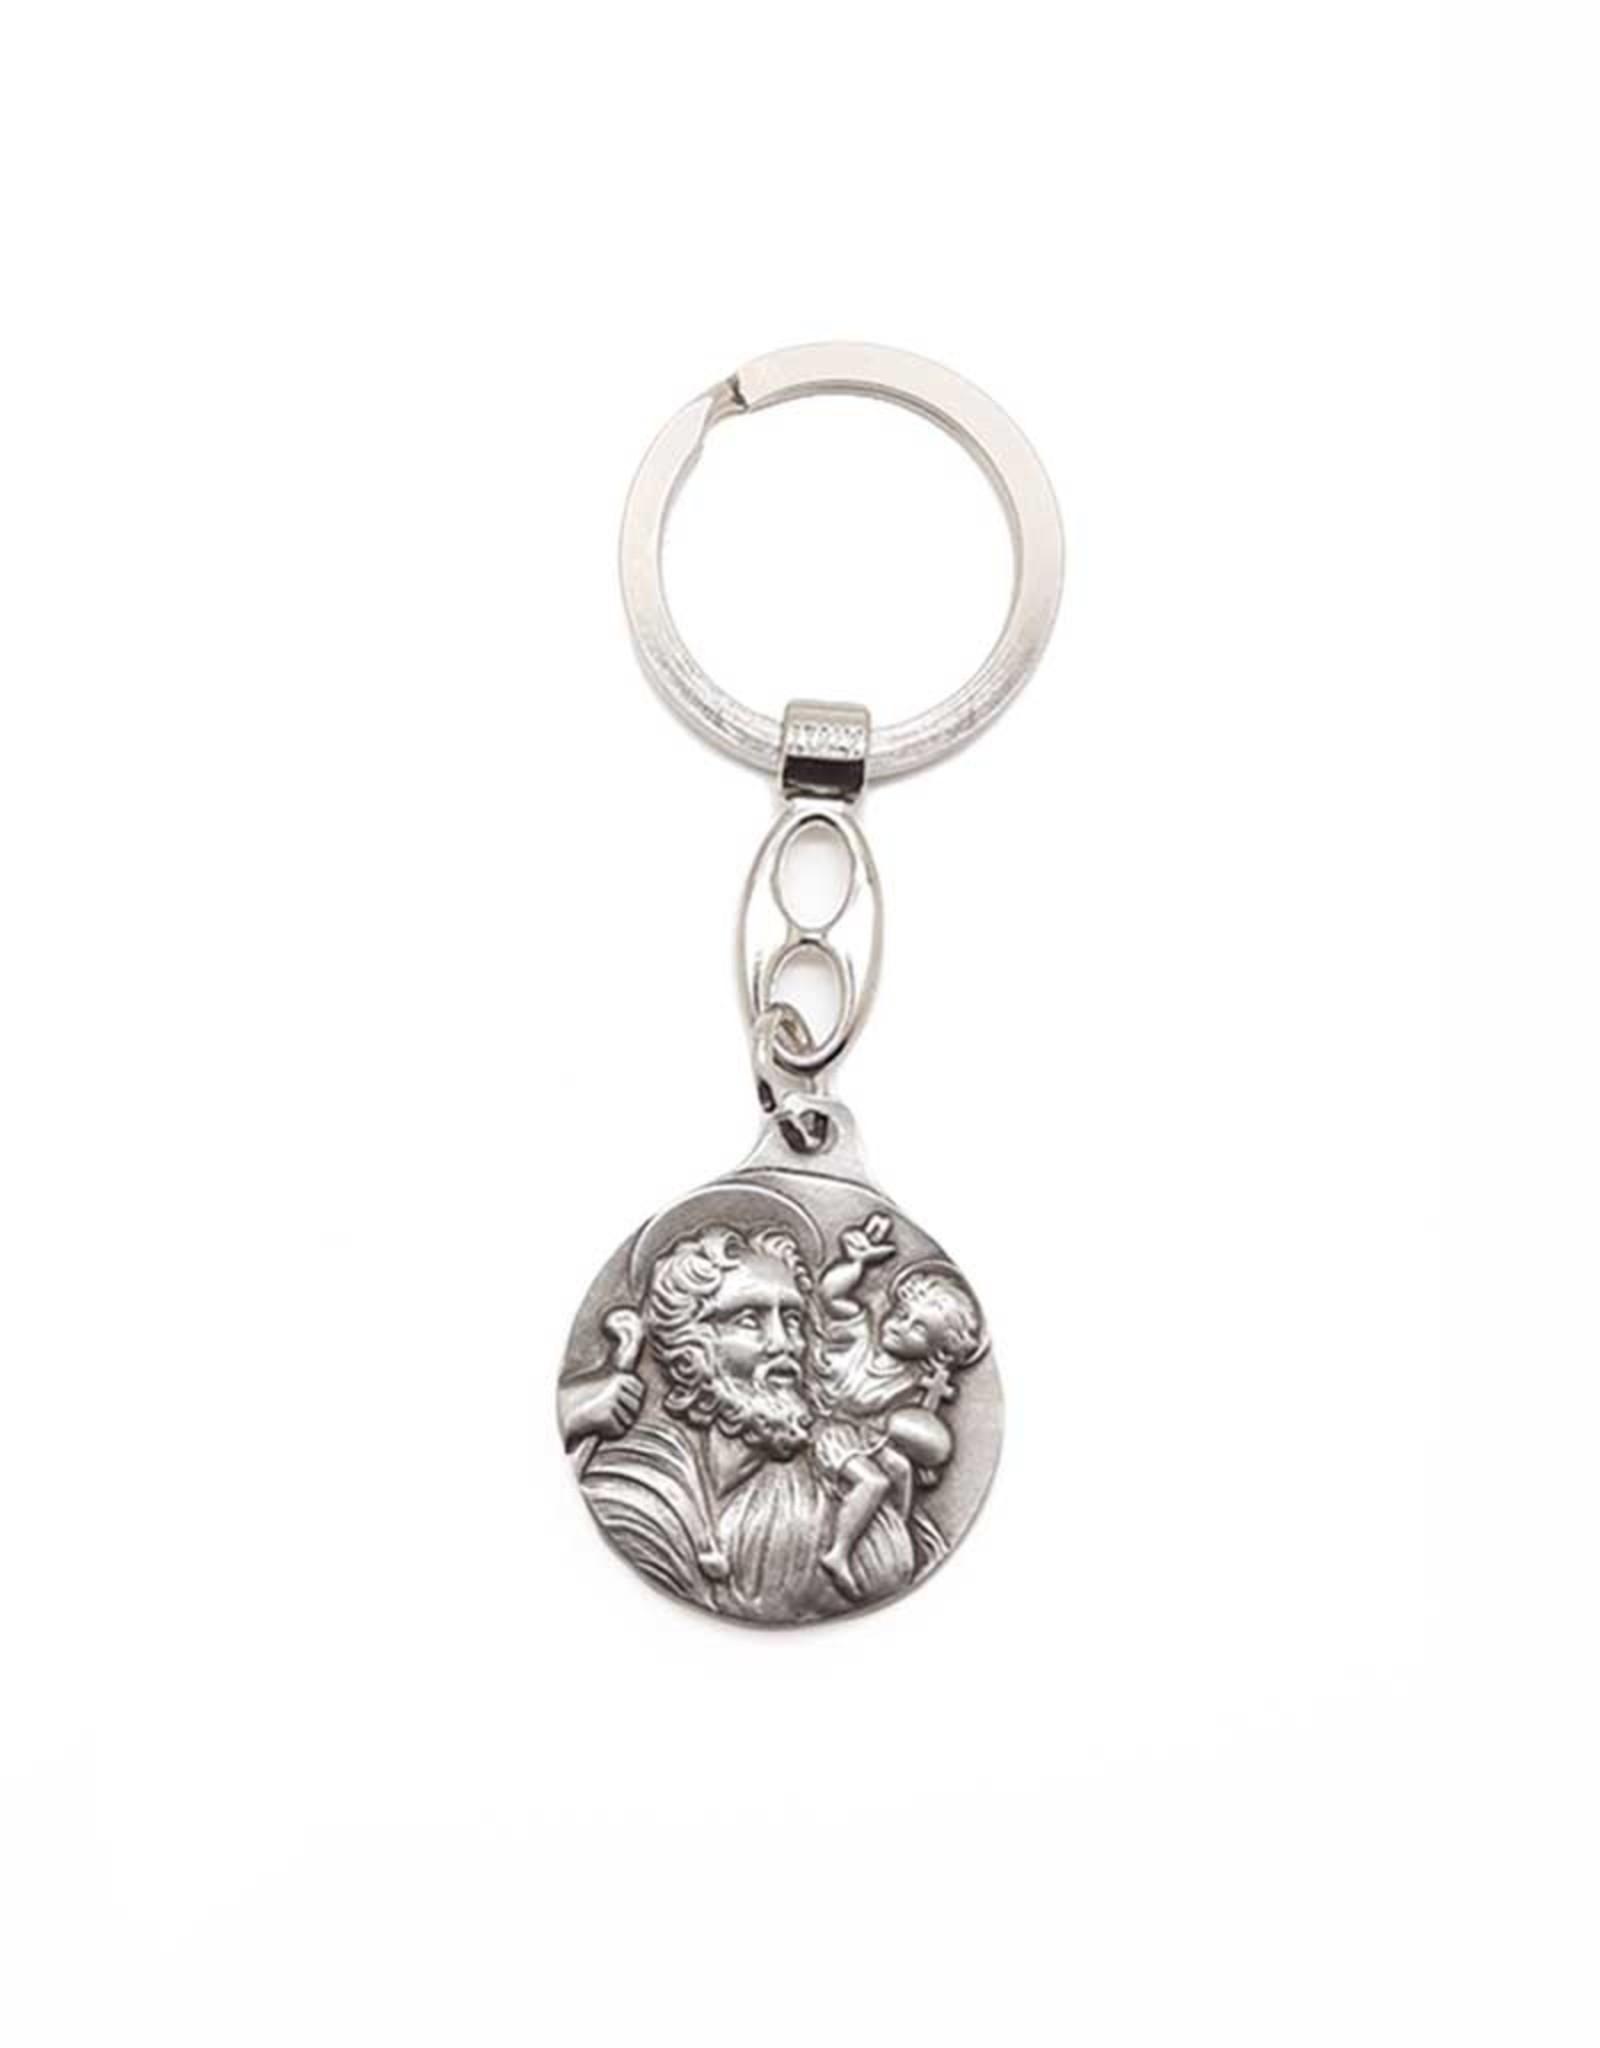 Keychain : Saint Joseph / Saint Christopher